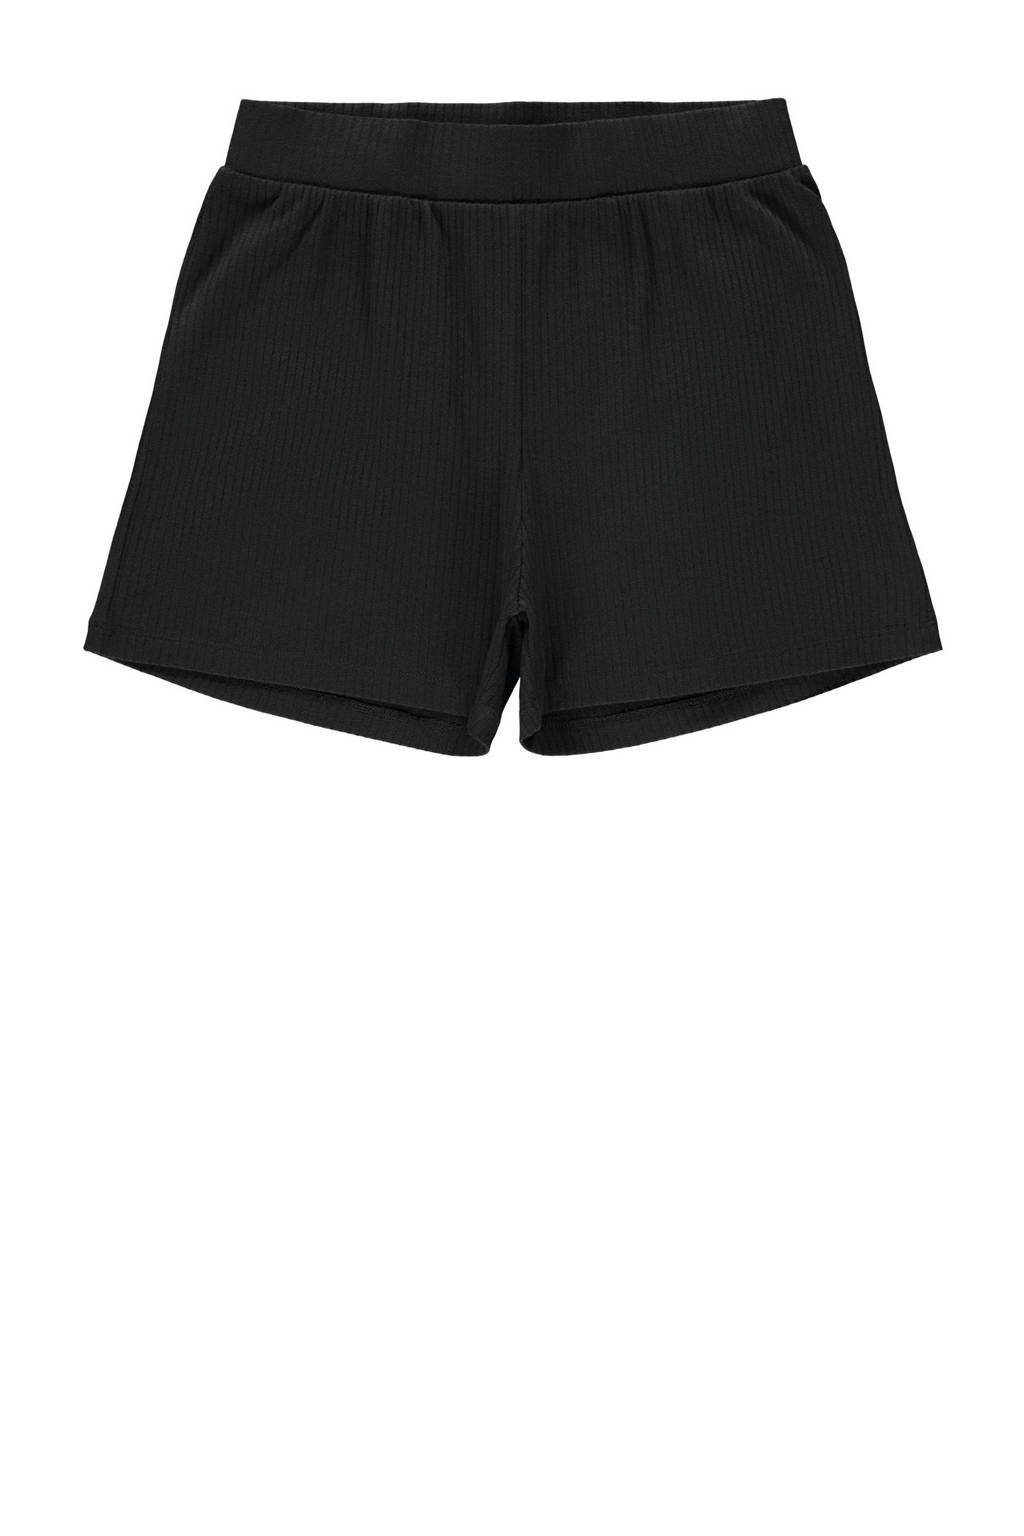 LMTD regular fit short Nunne met textuur zwart, Zwart